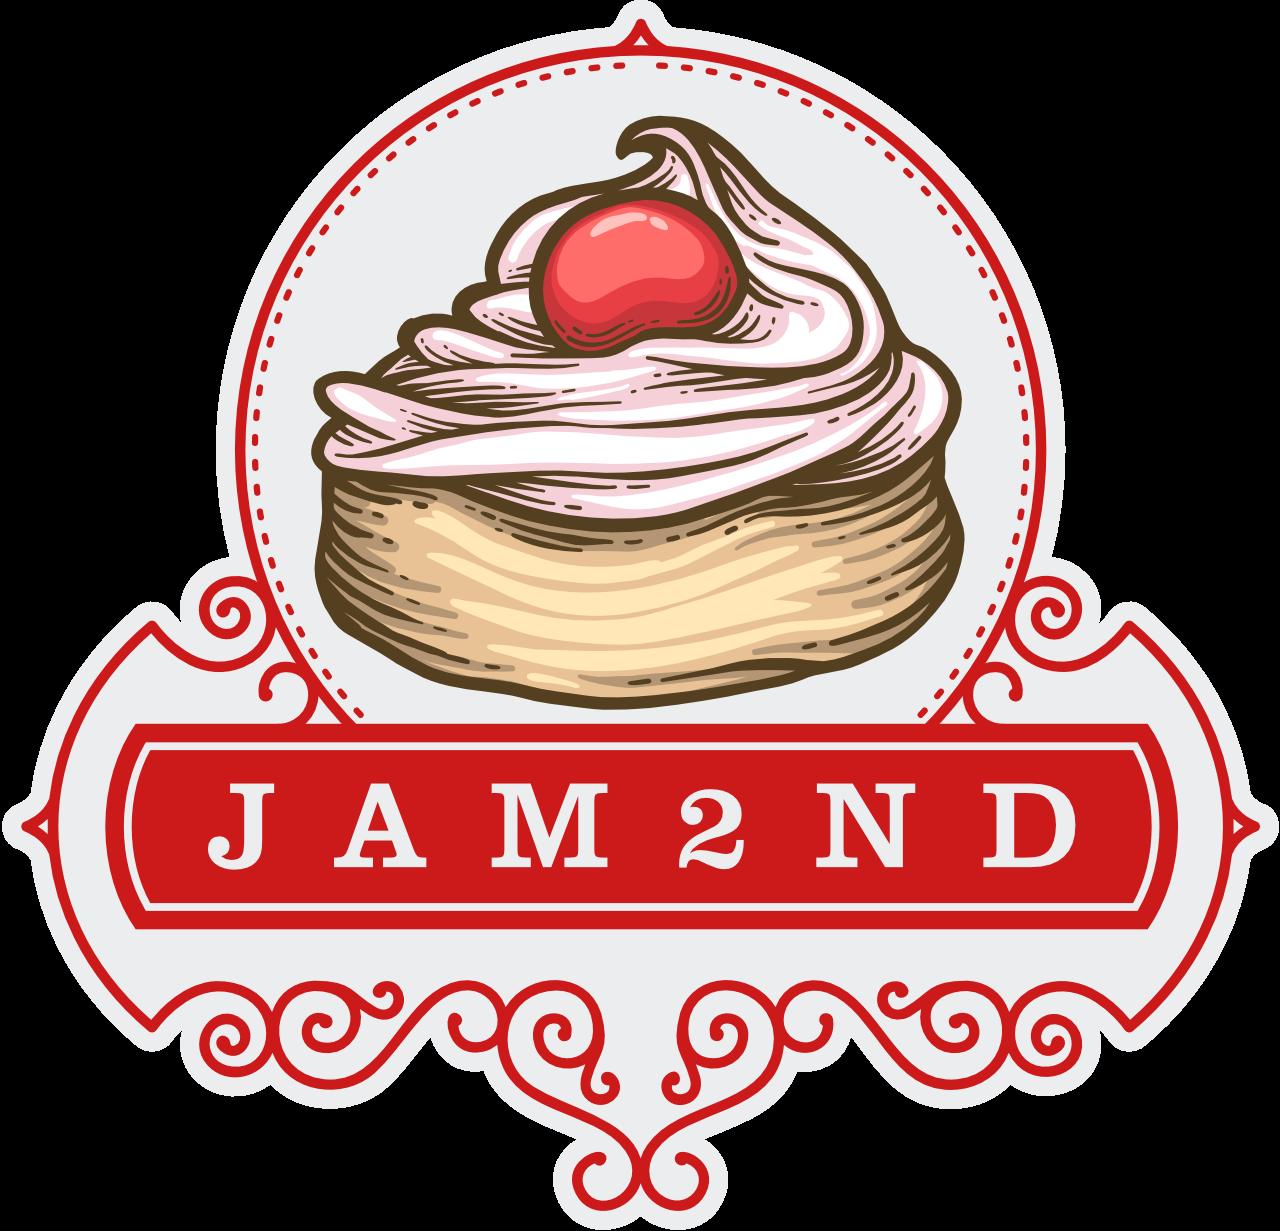 Jam2nd logo